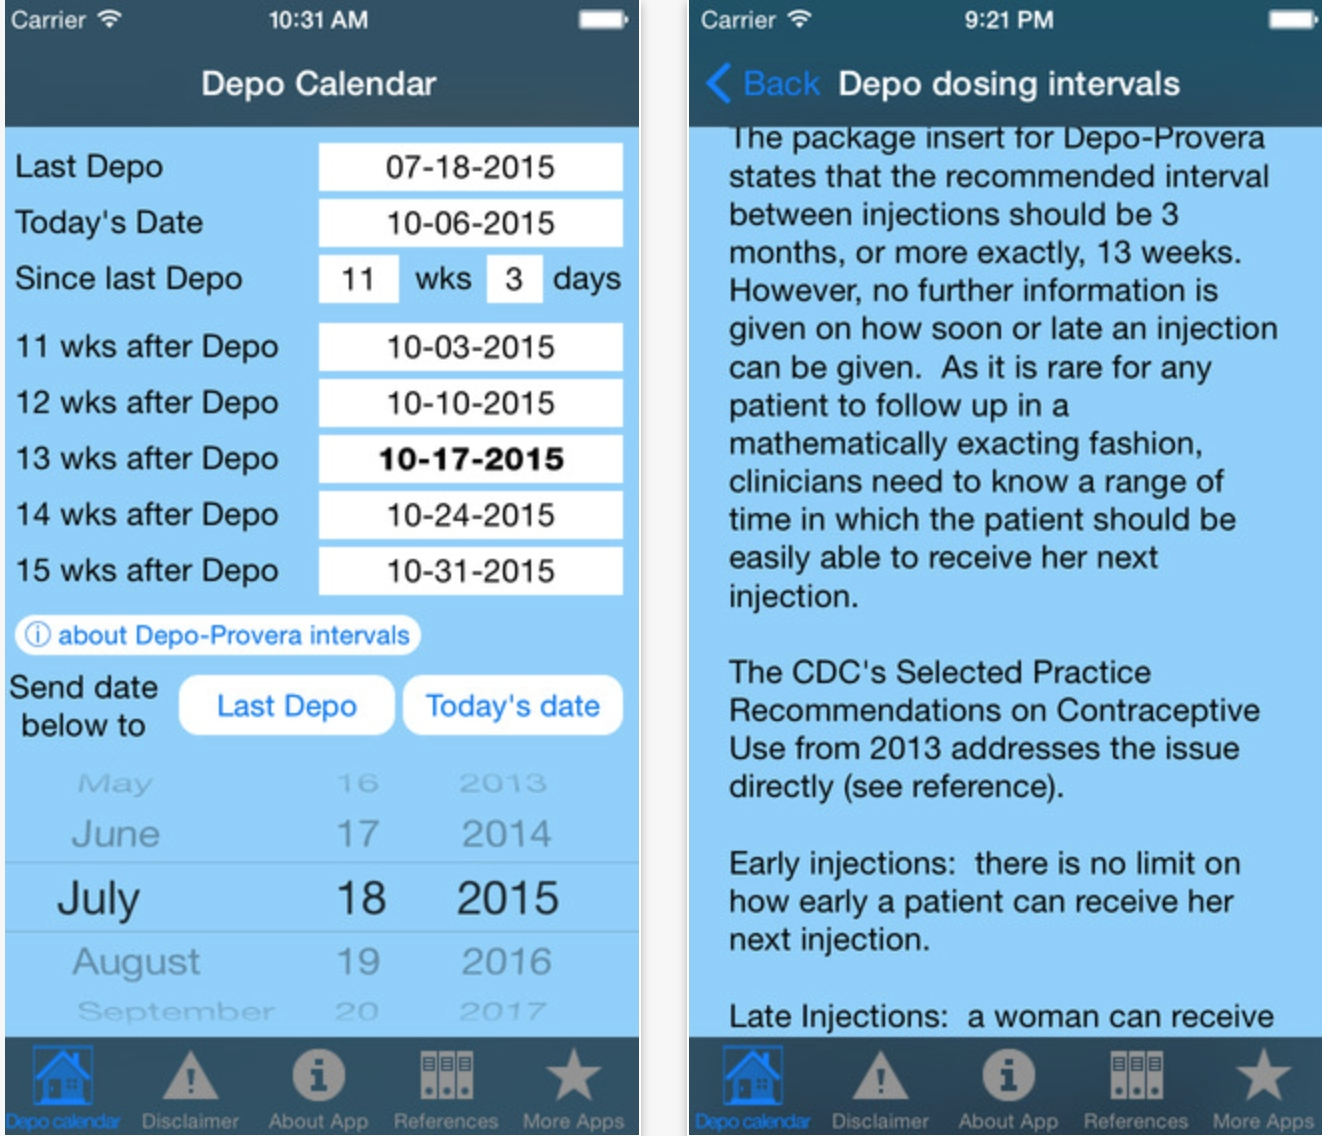 Depo Calendar App Could Significantly Improve Contraception  Depo-Provera Schedule Calendar